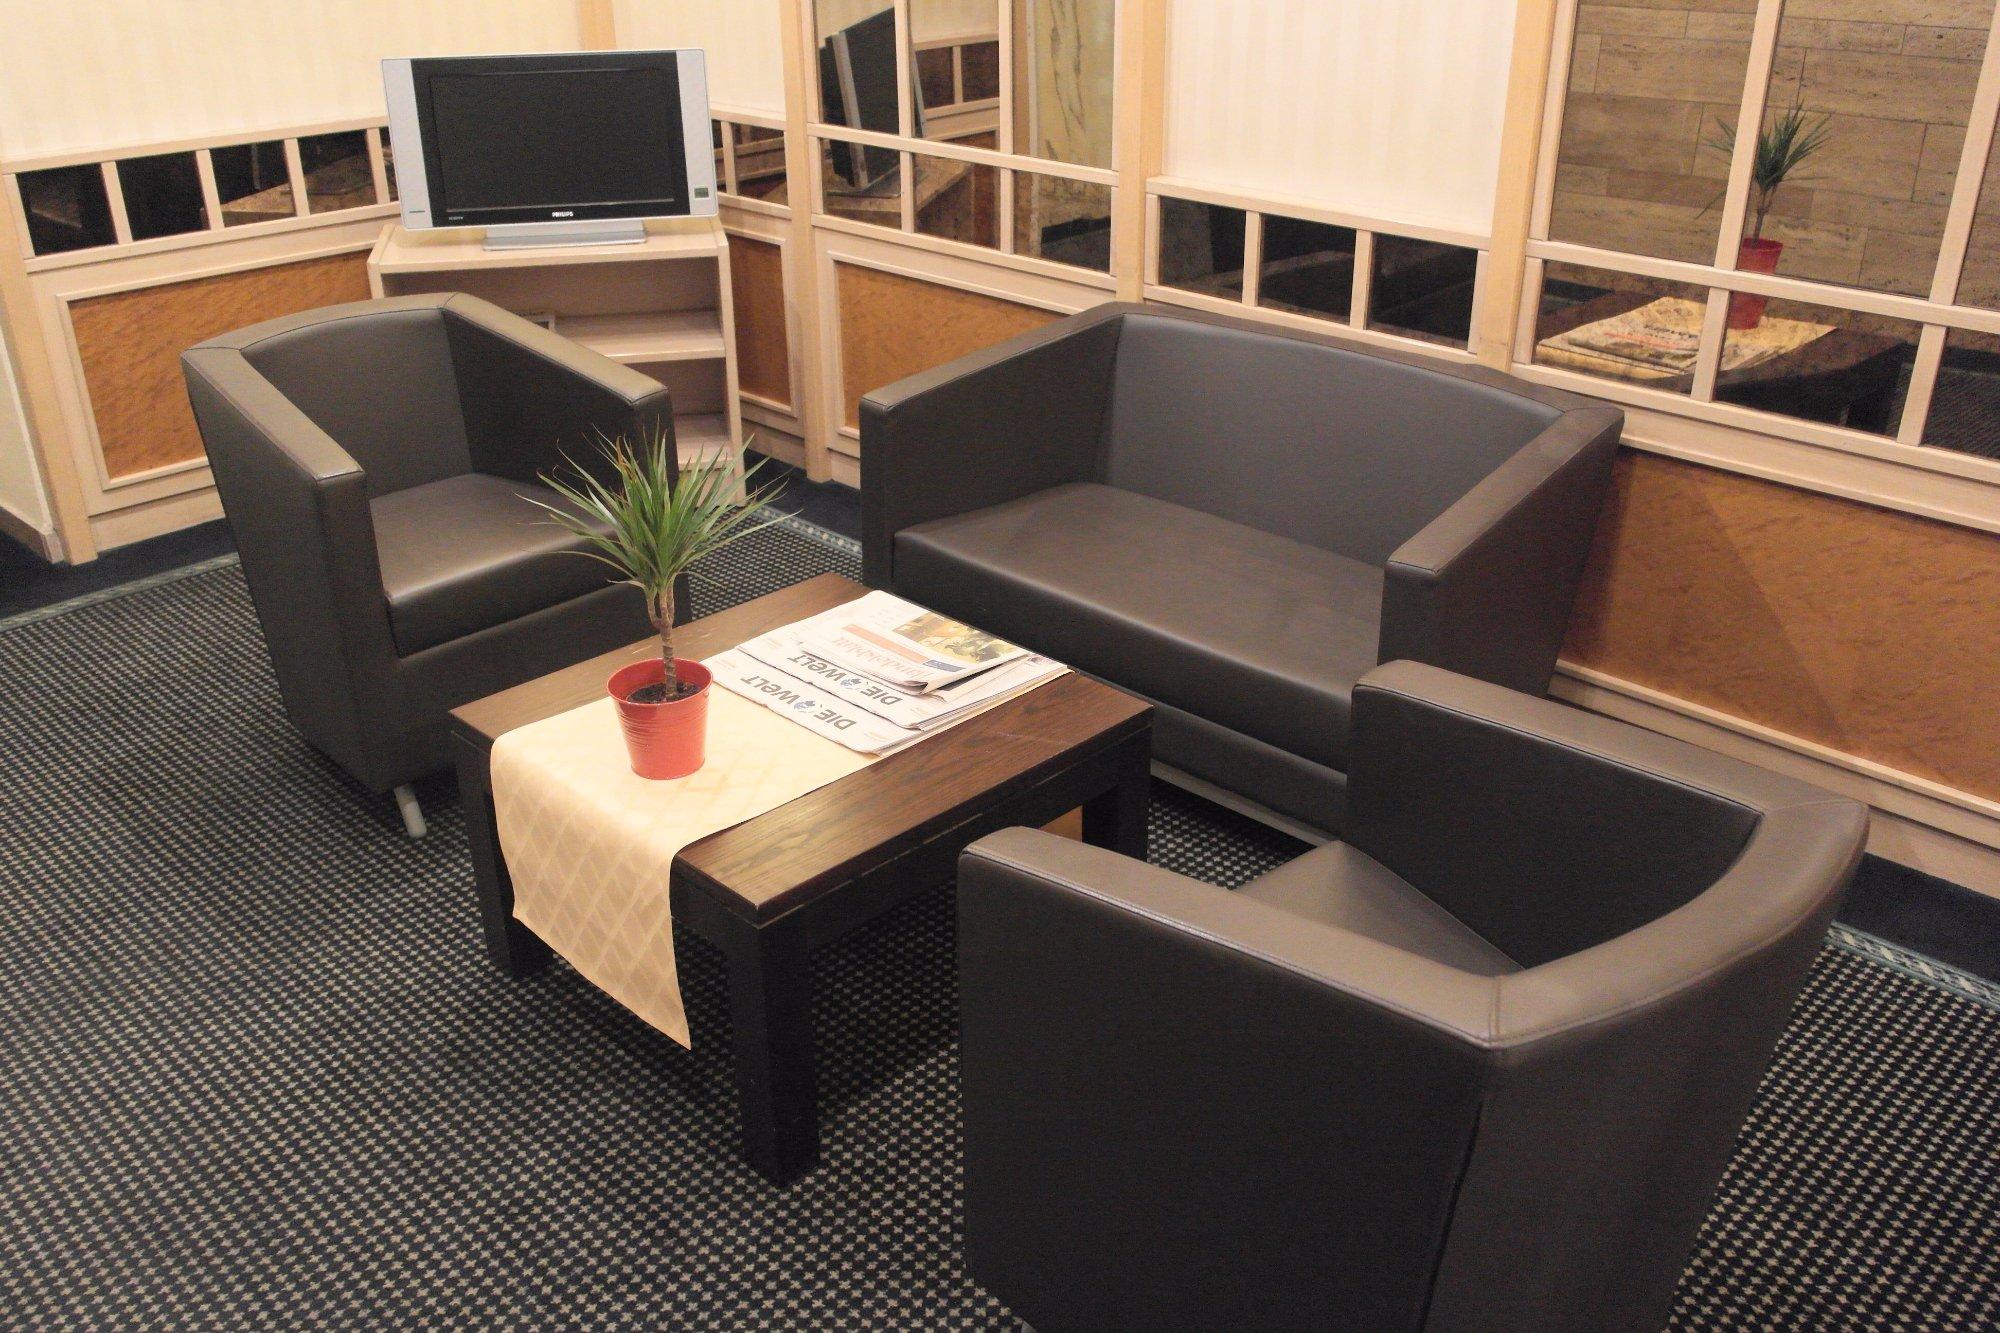 hotel daniel m nchen arvostelut sek hintavertailu. Black Bedroom Furniture Sets. Home Design Ideas